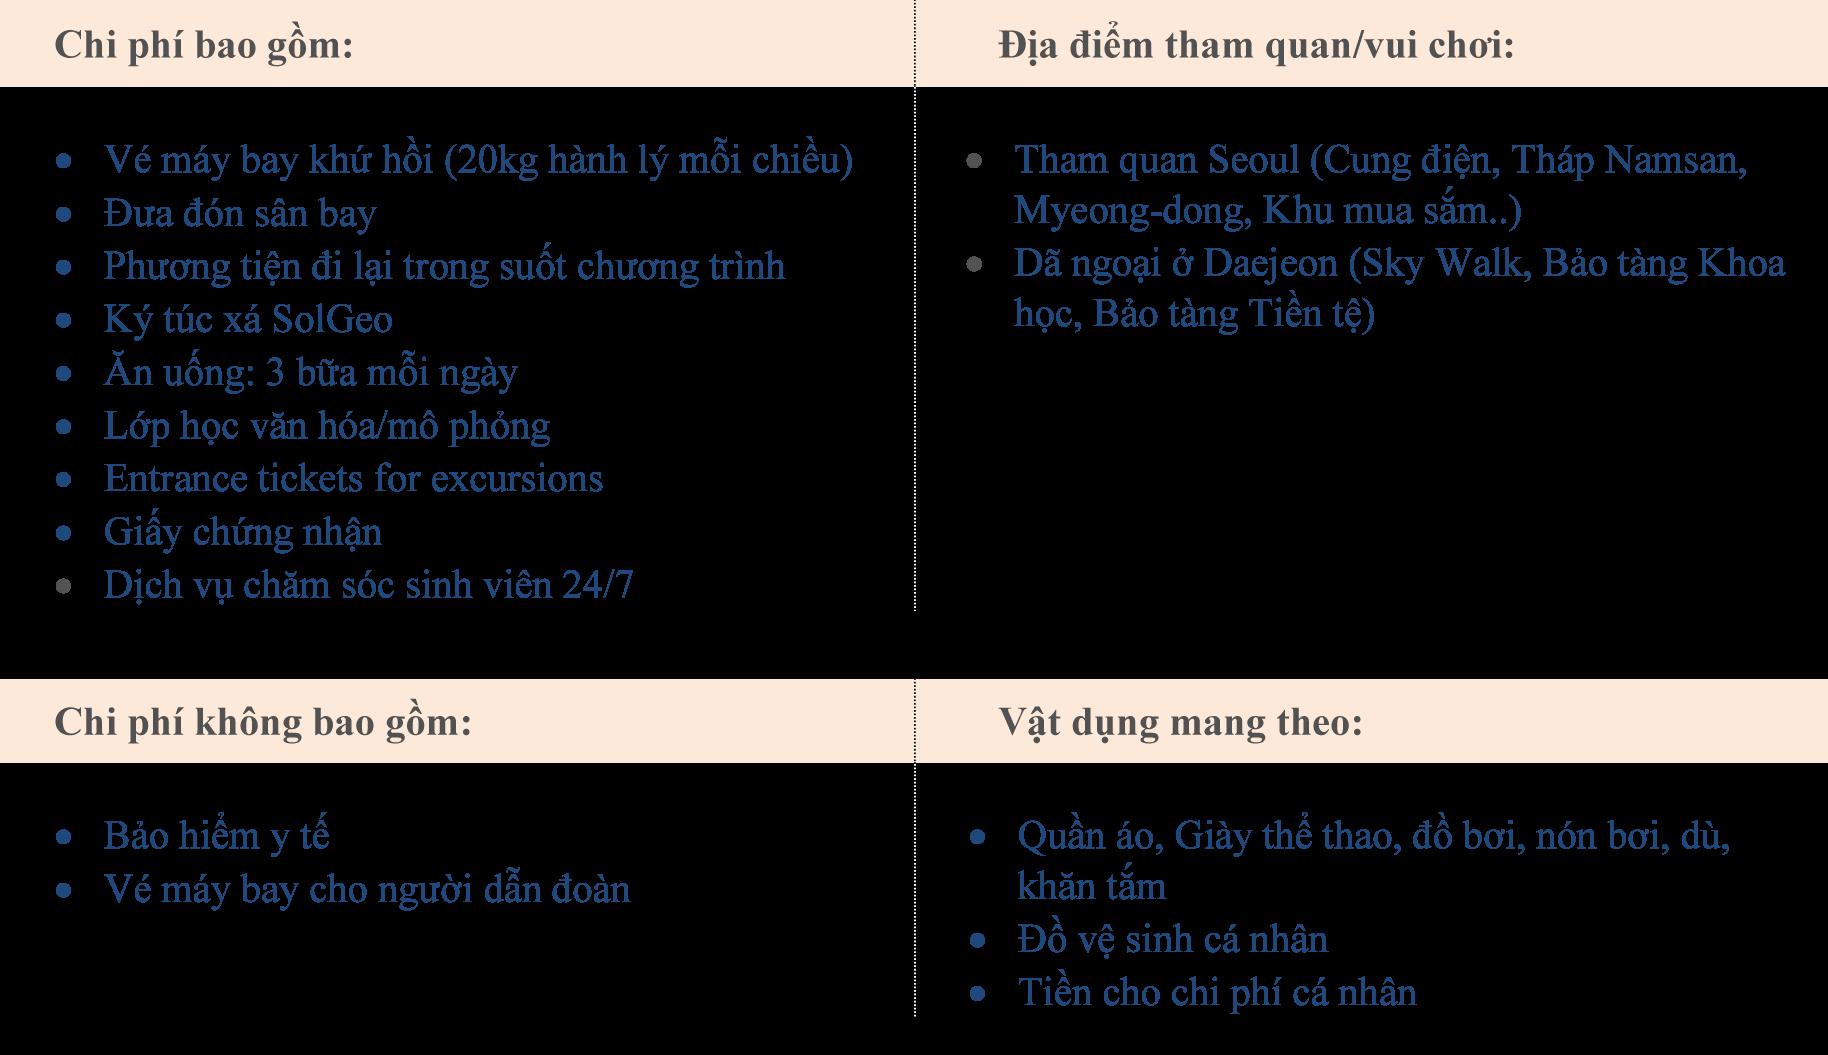 chi-phi-chuong-trinh